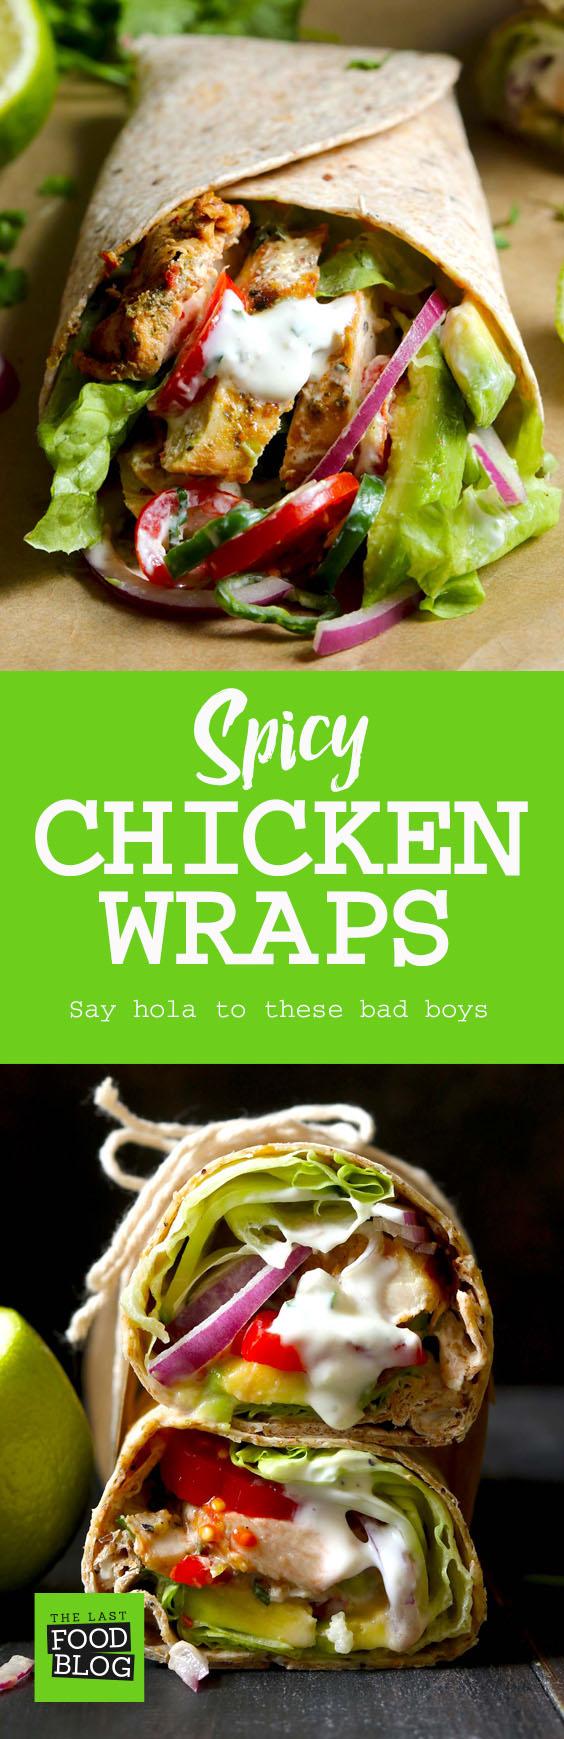 Spicy Chicken Wraps - thelastfoodblog.com